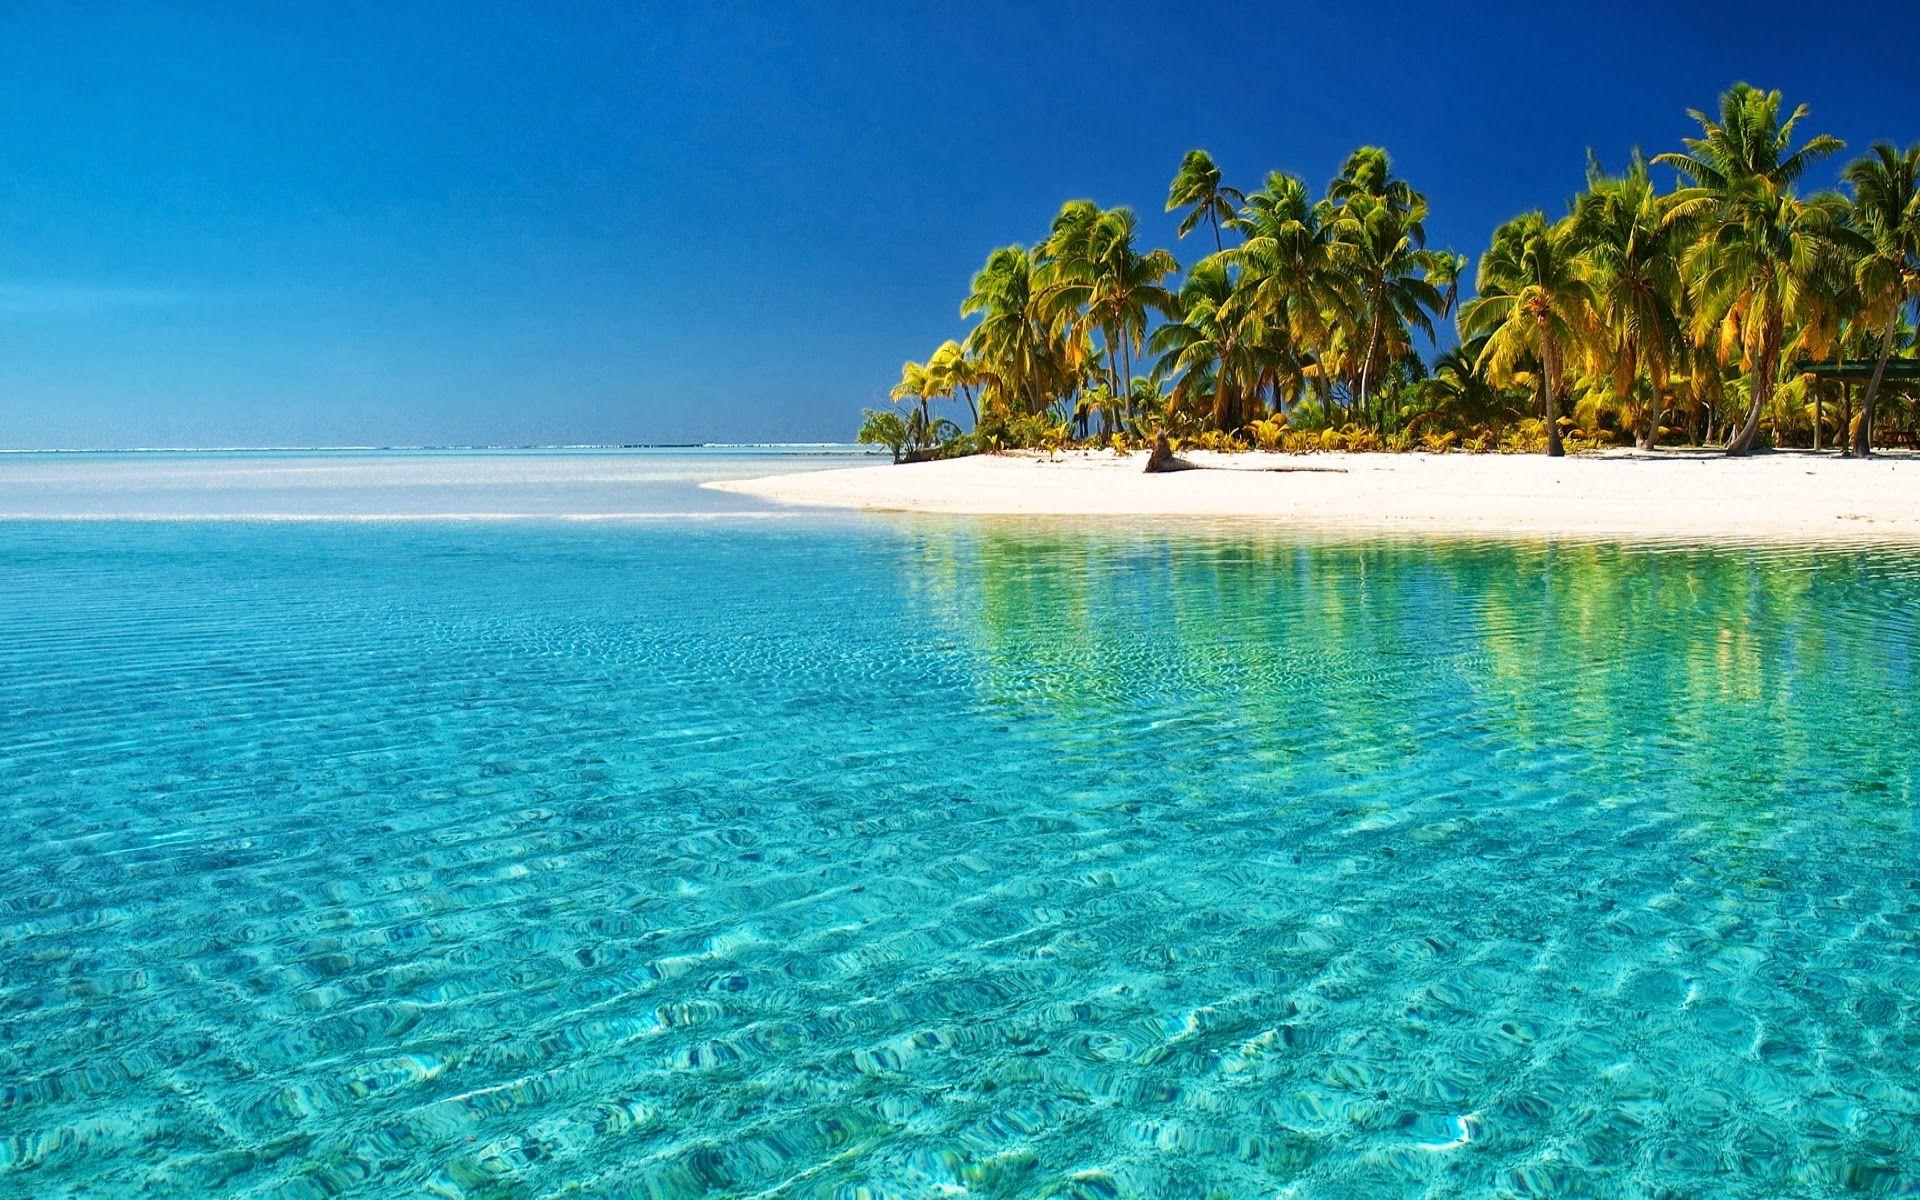 Delortae Agency Delortaeagency Beach Wallpaper Beautiful Beaches Most Beautiful Beaches Desktop wallpaper beach paradise